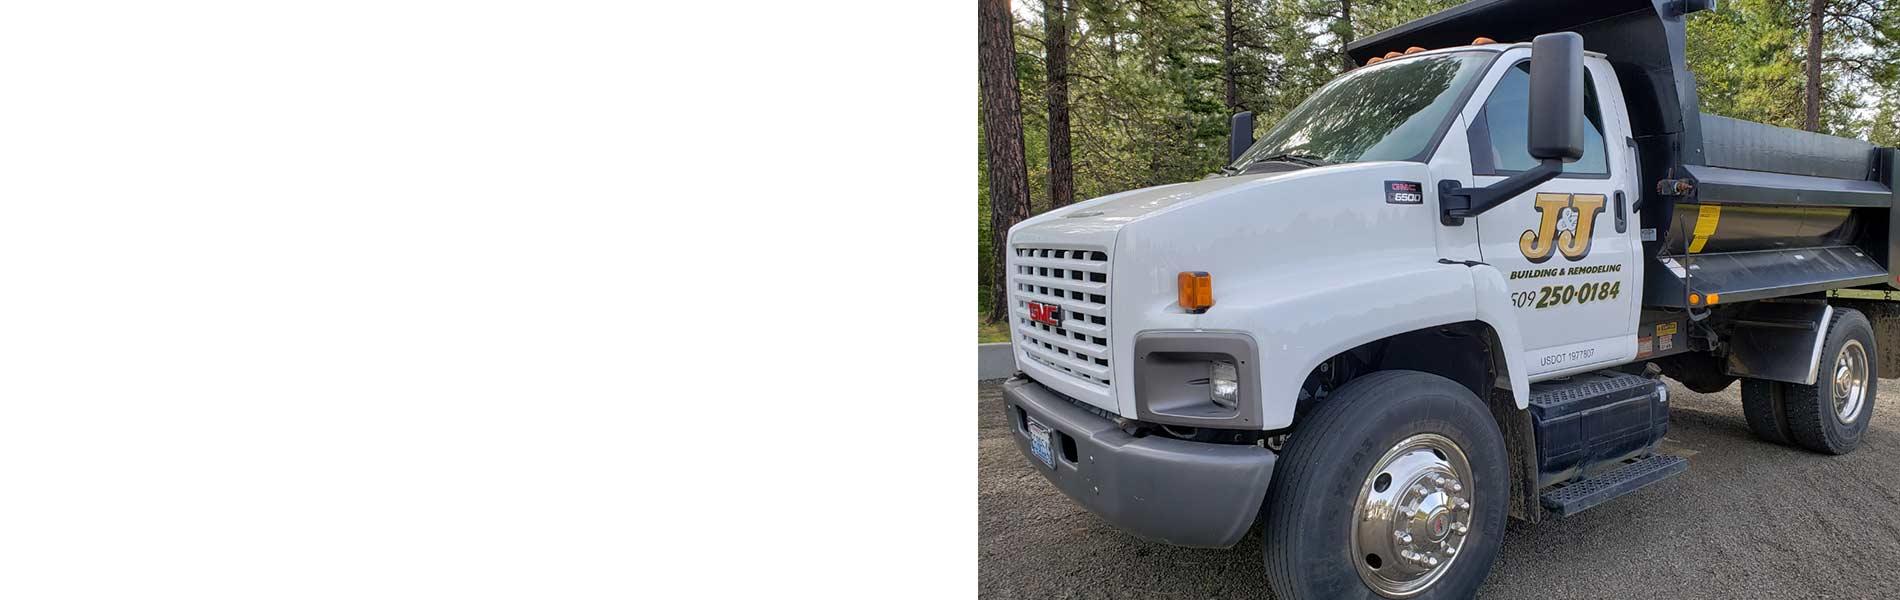 J & J Building & Remodeling's company dump truck